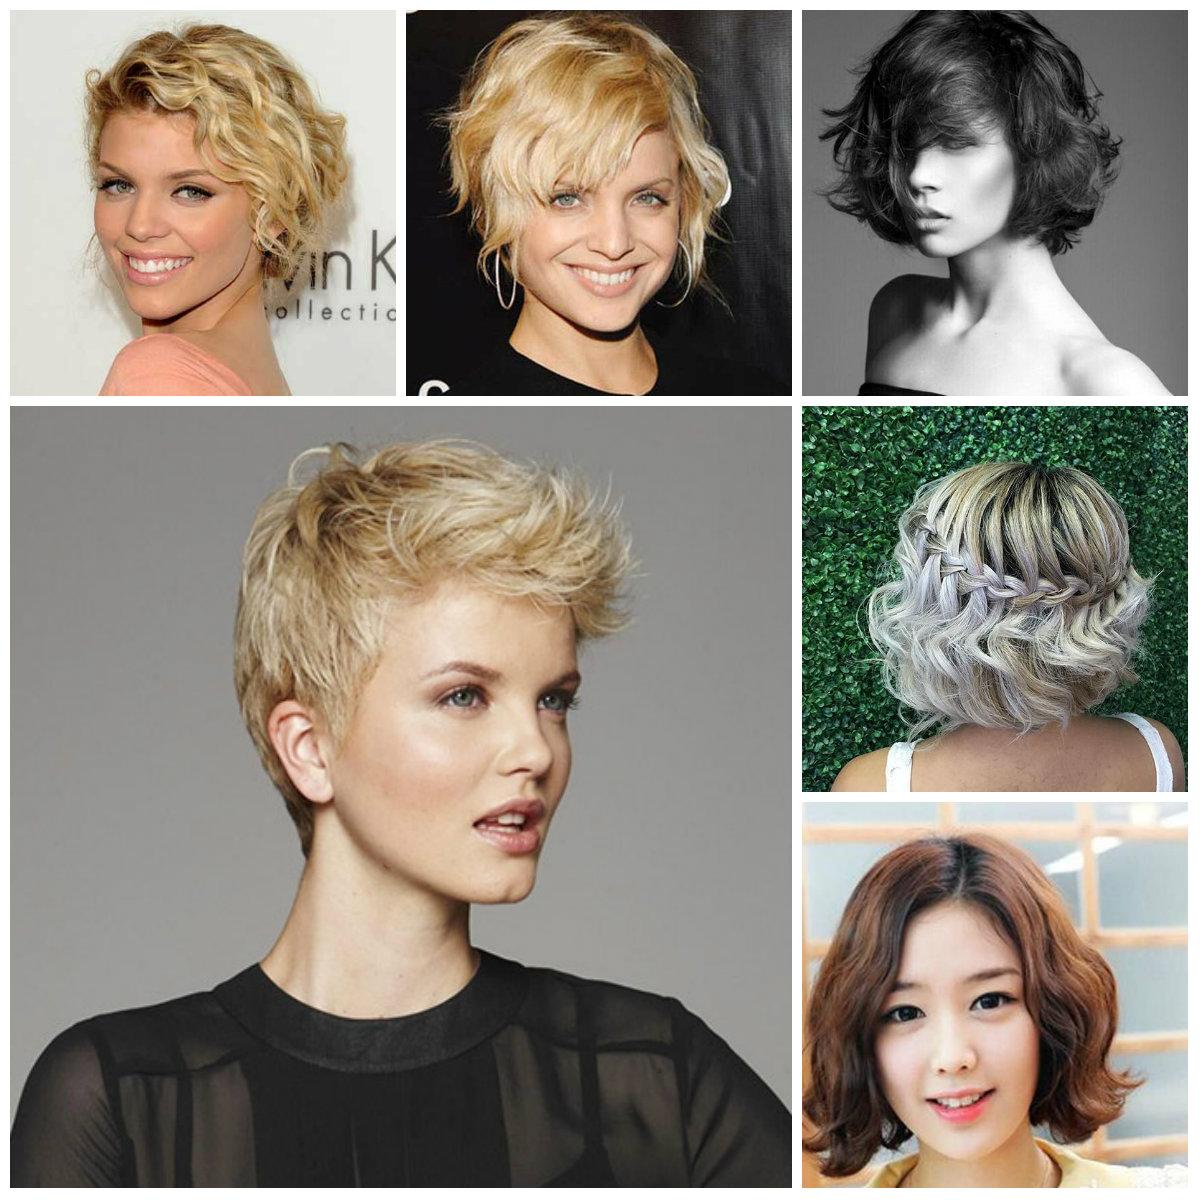 Neu beliebte kurze gewellte Frisuren